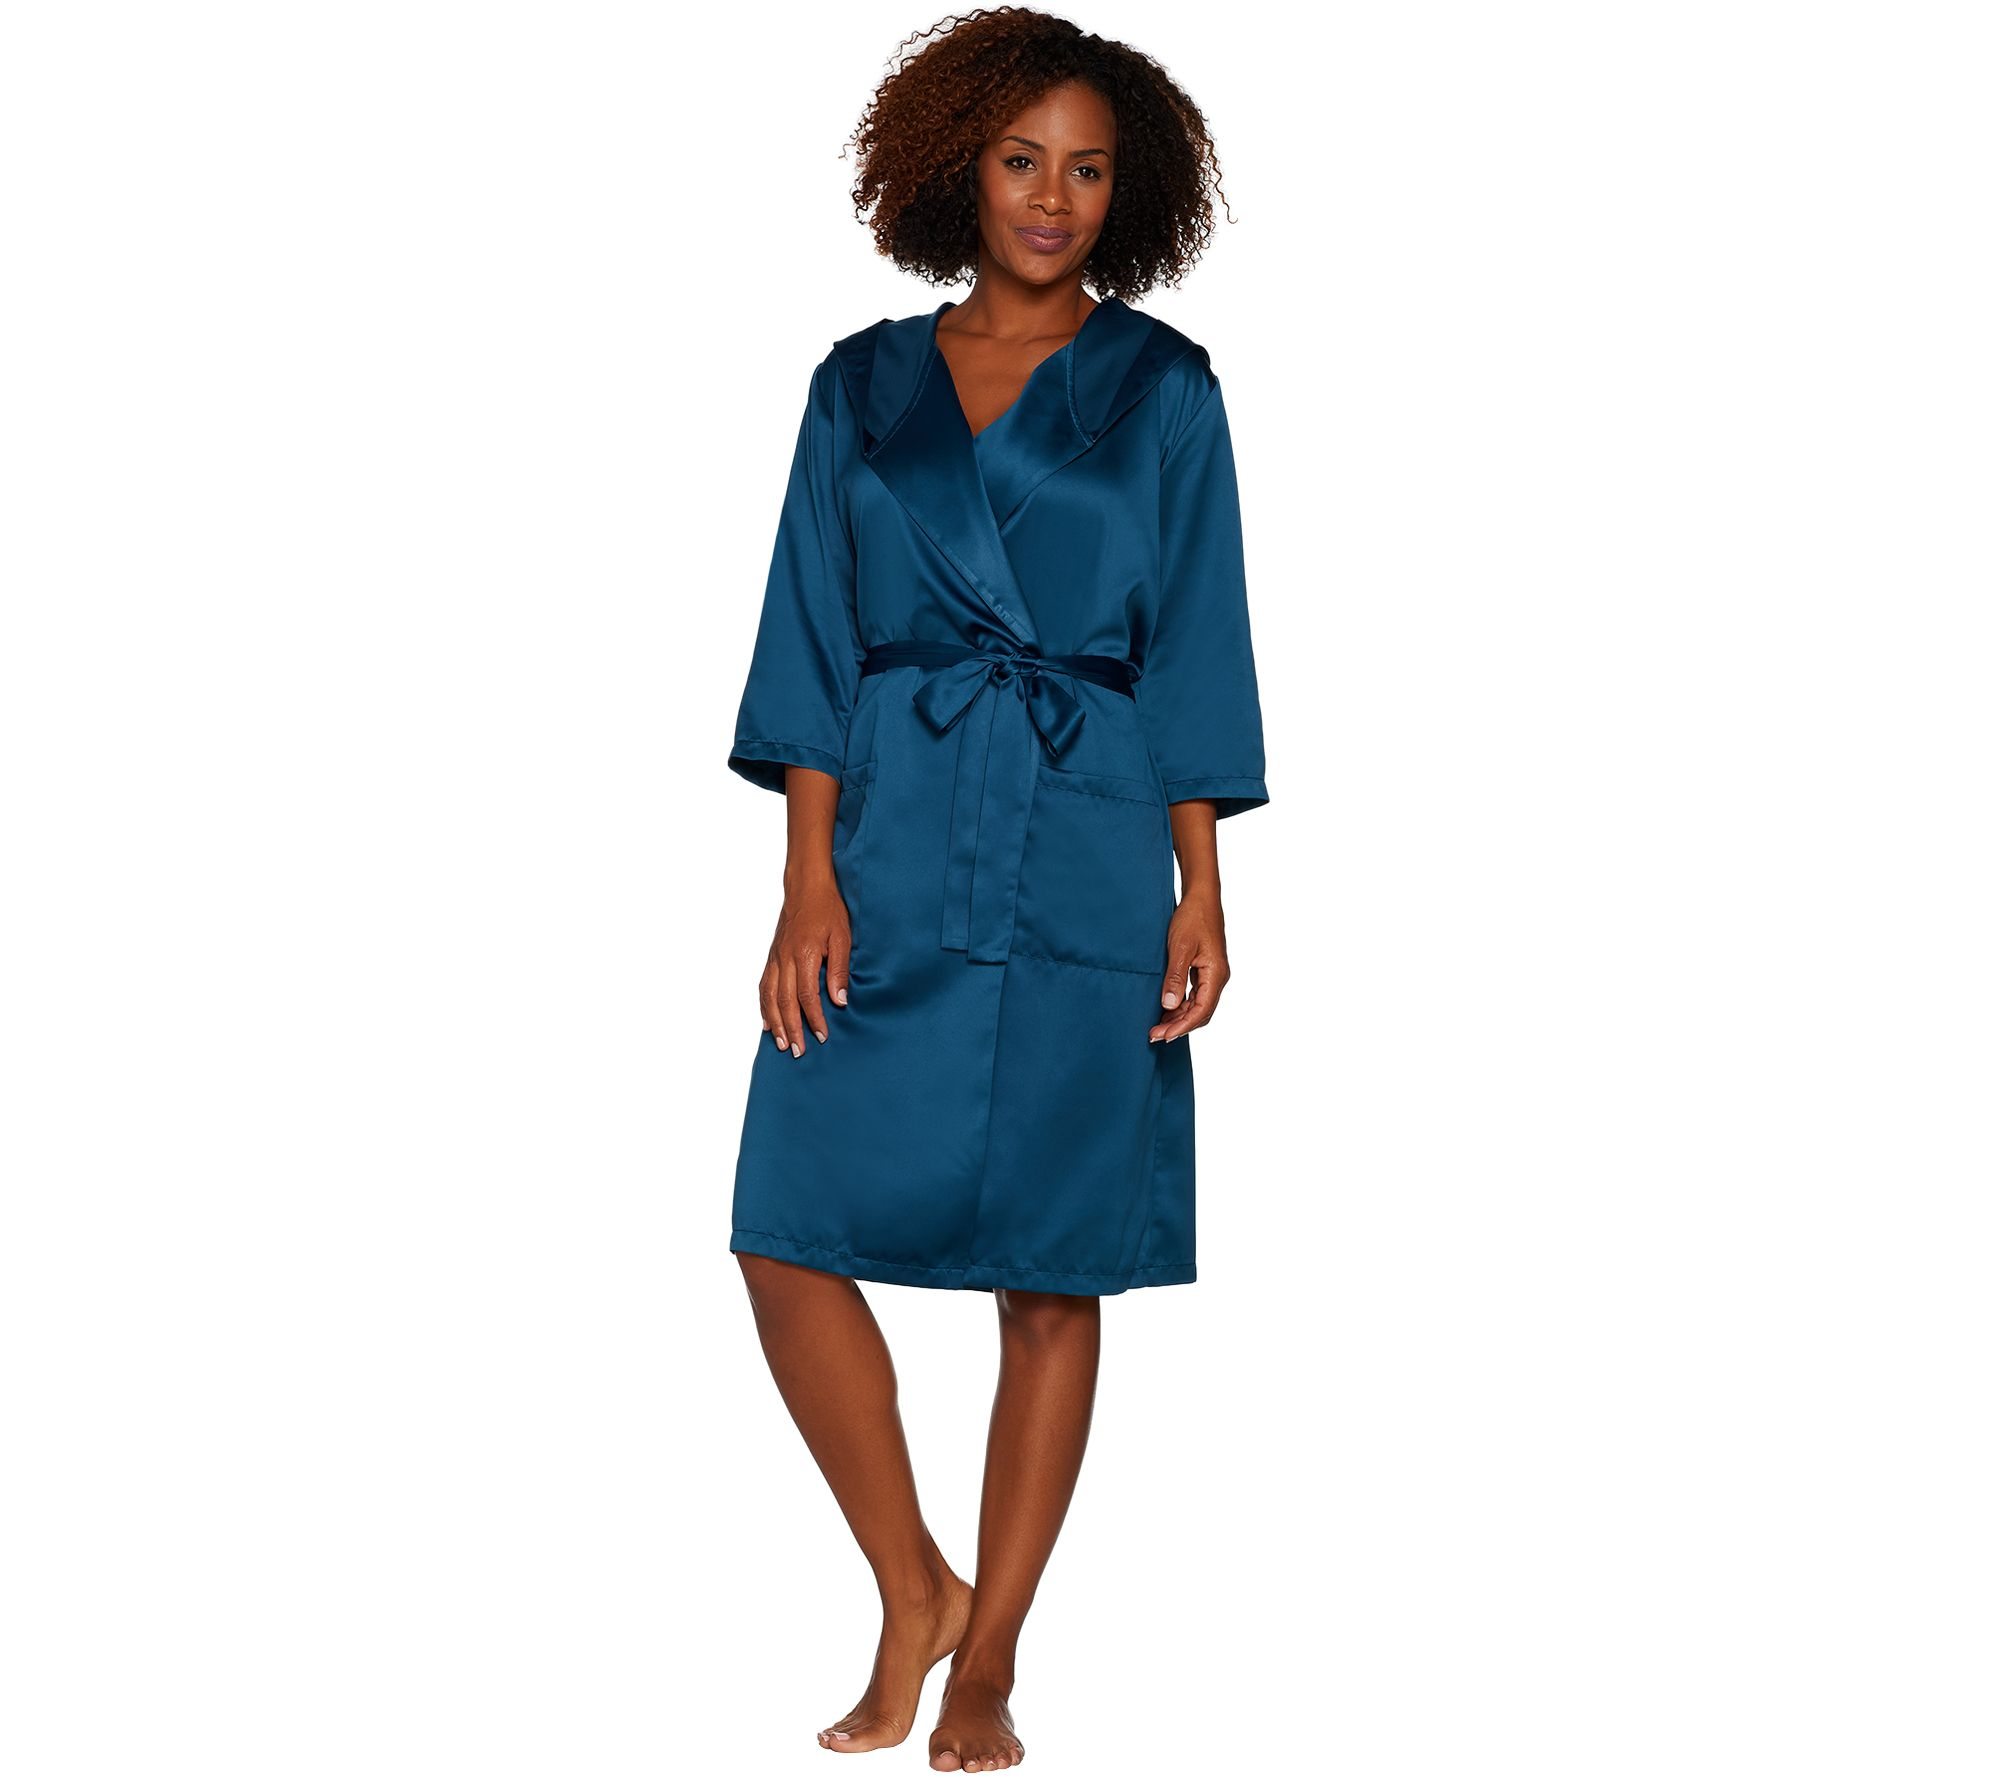 d280a8bdae Casa Zeta-Jones Faux Silk Robe with Hood - Page 1 — QVC.com